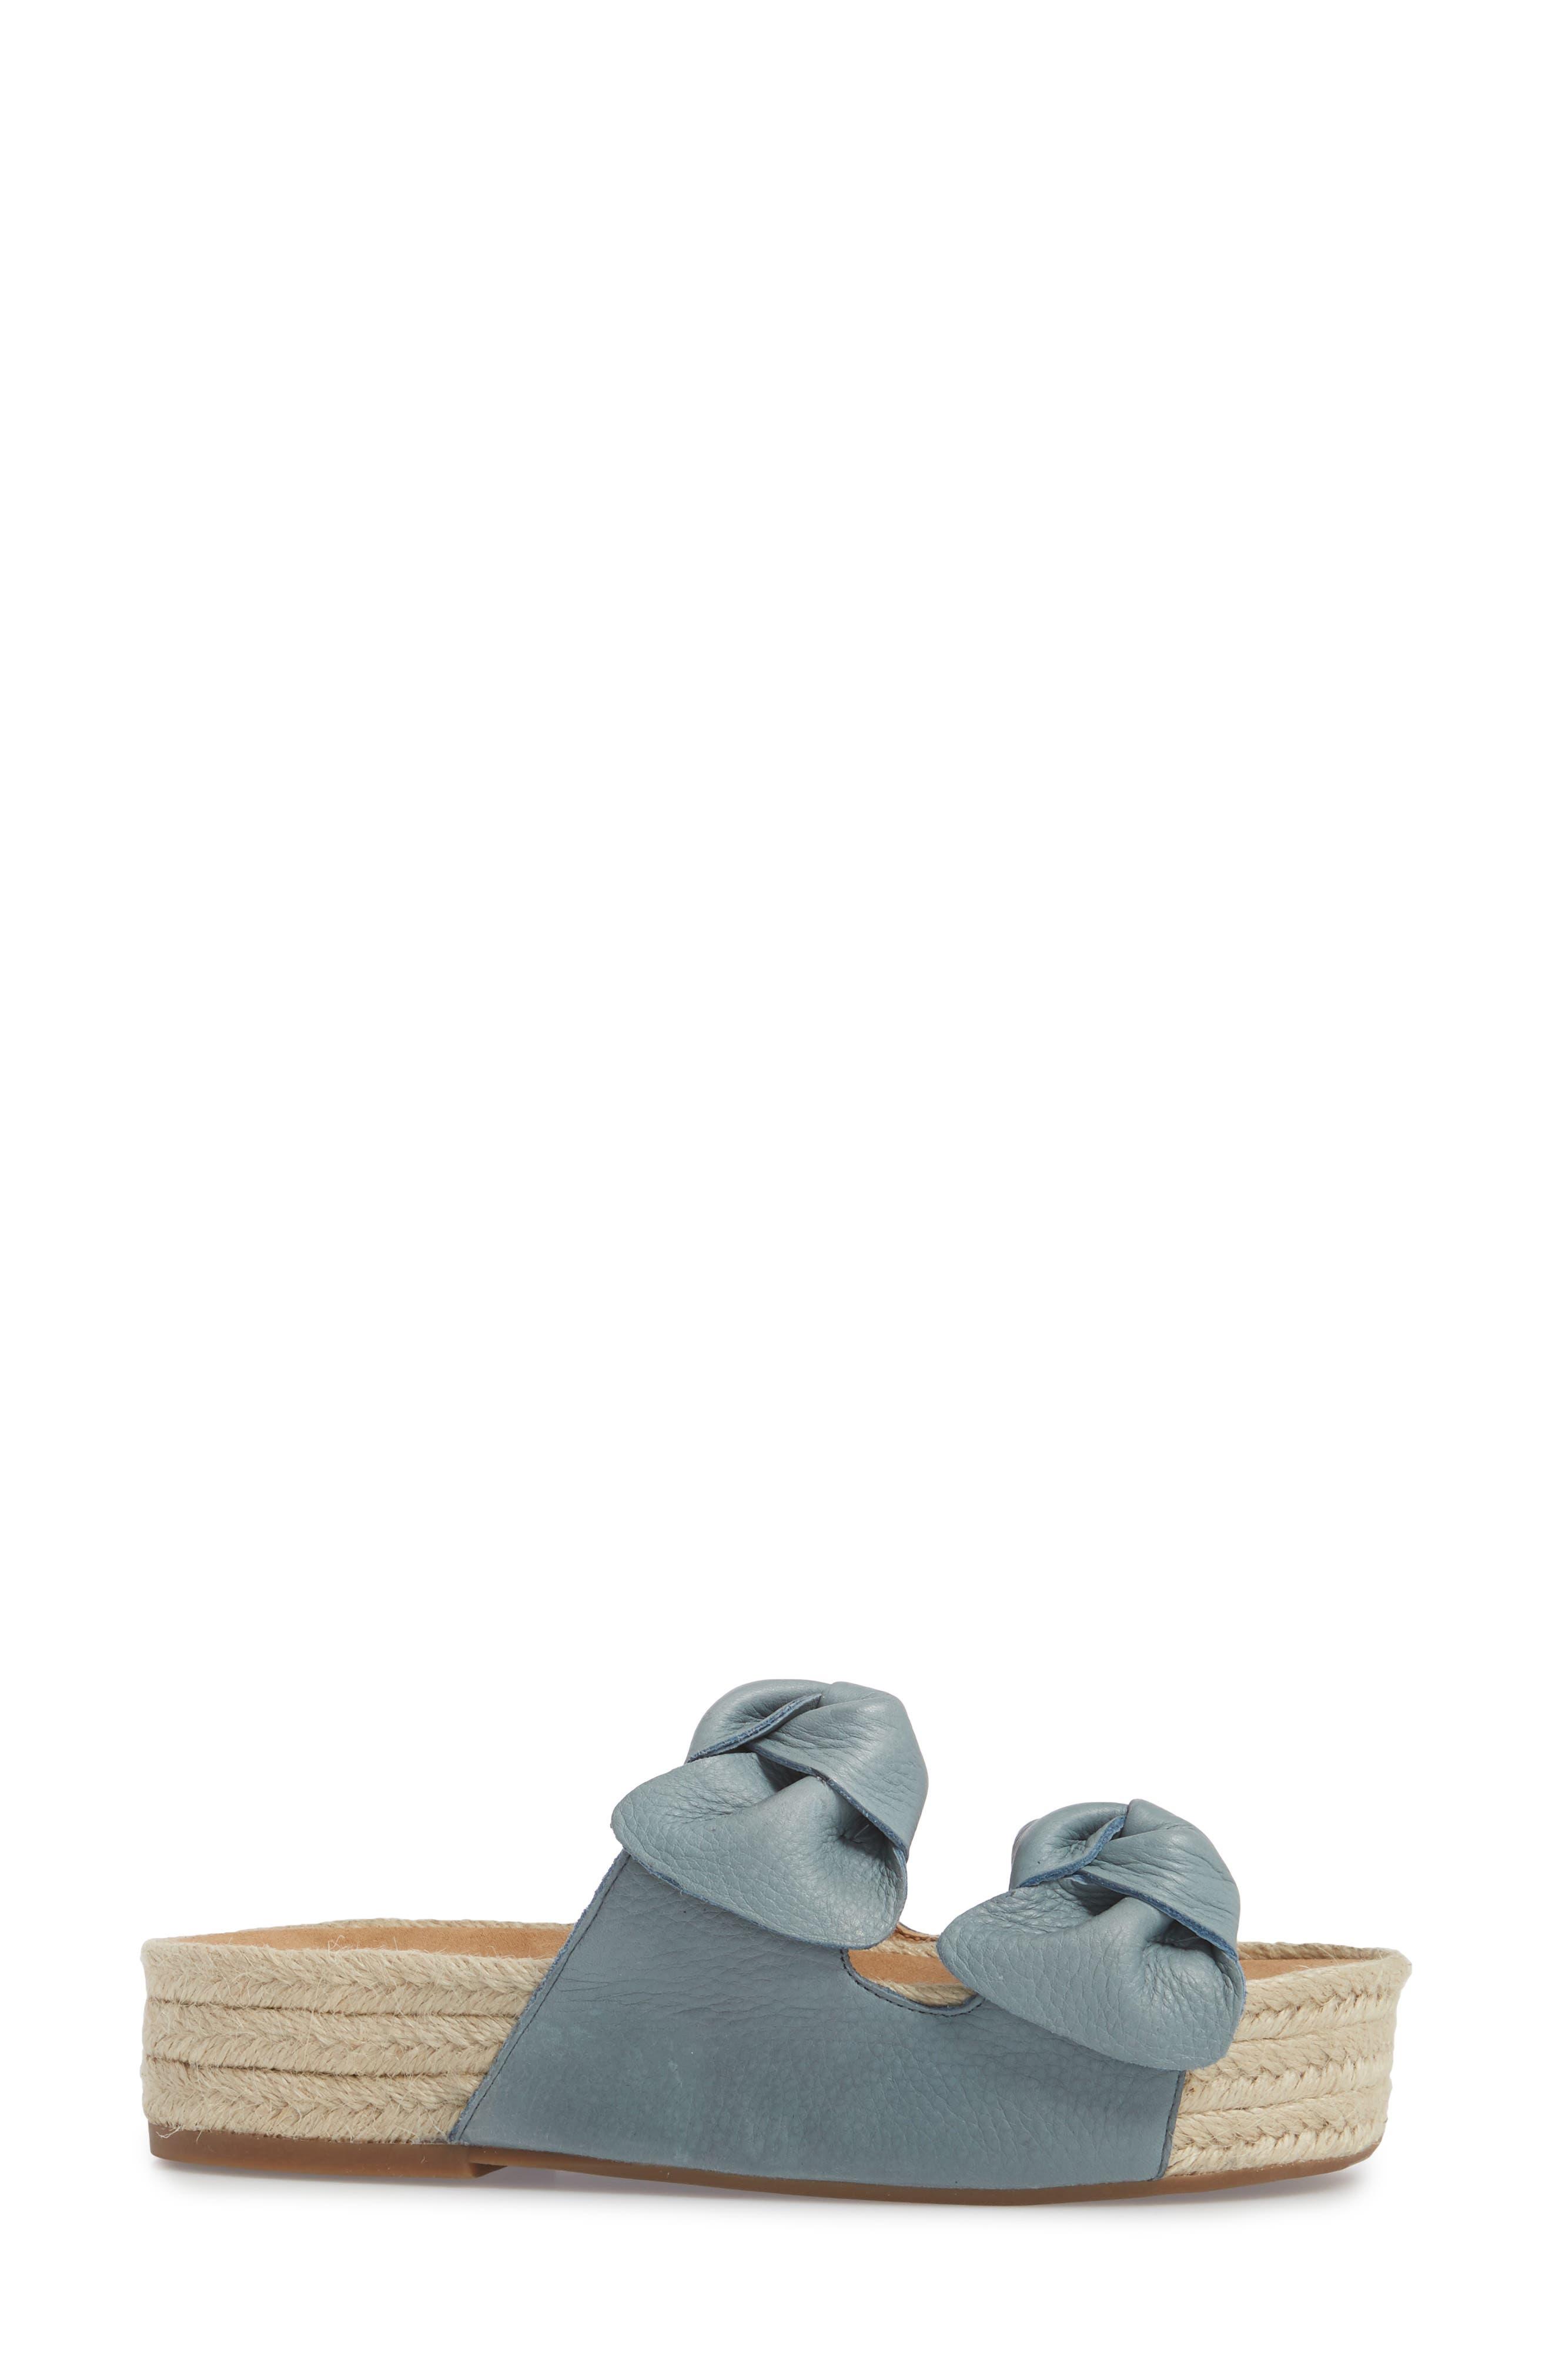 Izbremma Platform Espadrille Sandal,                             Alternate thumbnail 3, color,                             Infinity Leather